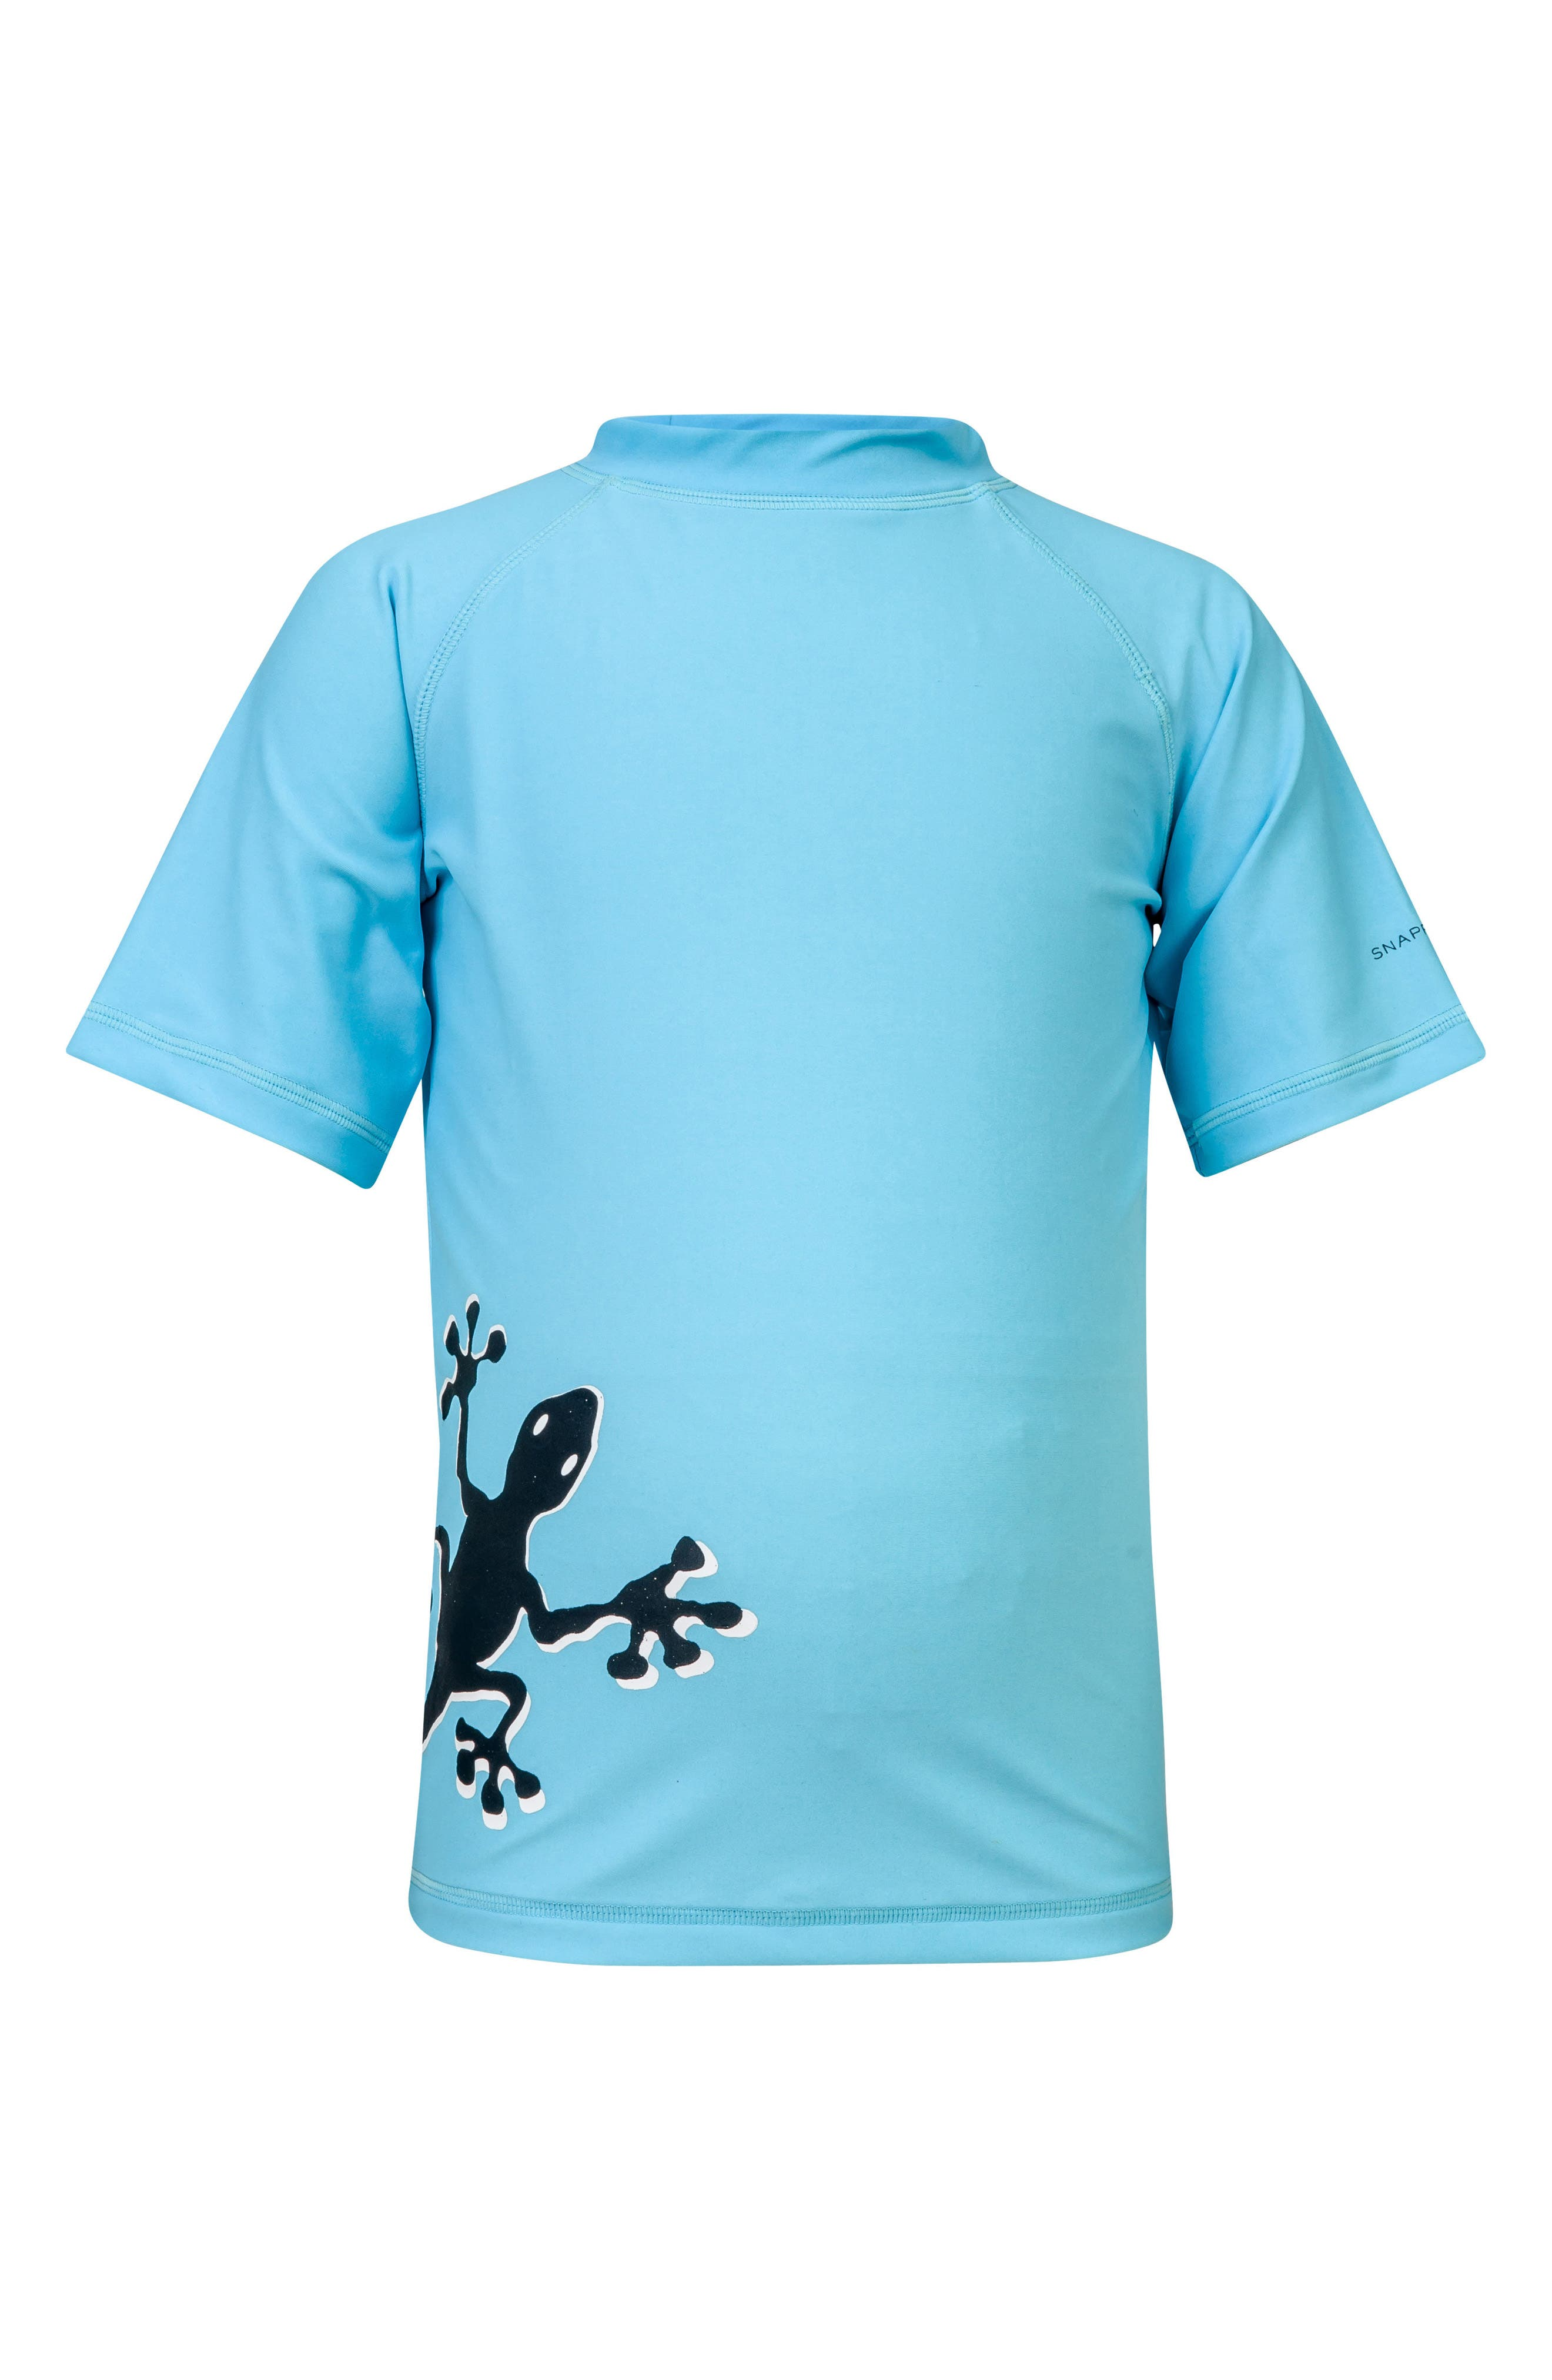 Gecko Short Sleeve Rashguard,                         Main,                         color, Aqua Blue